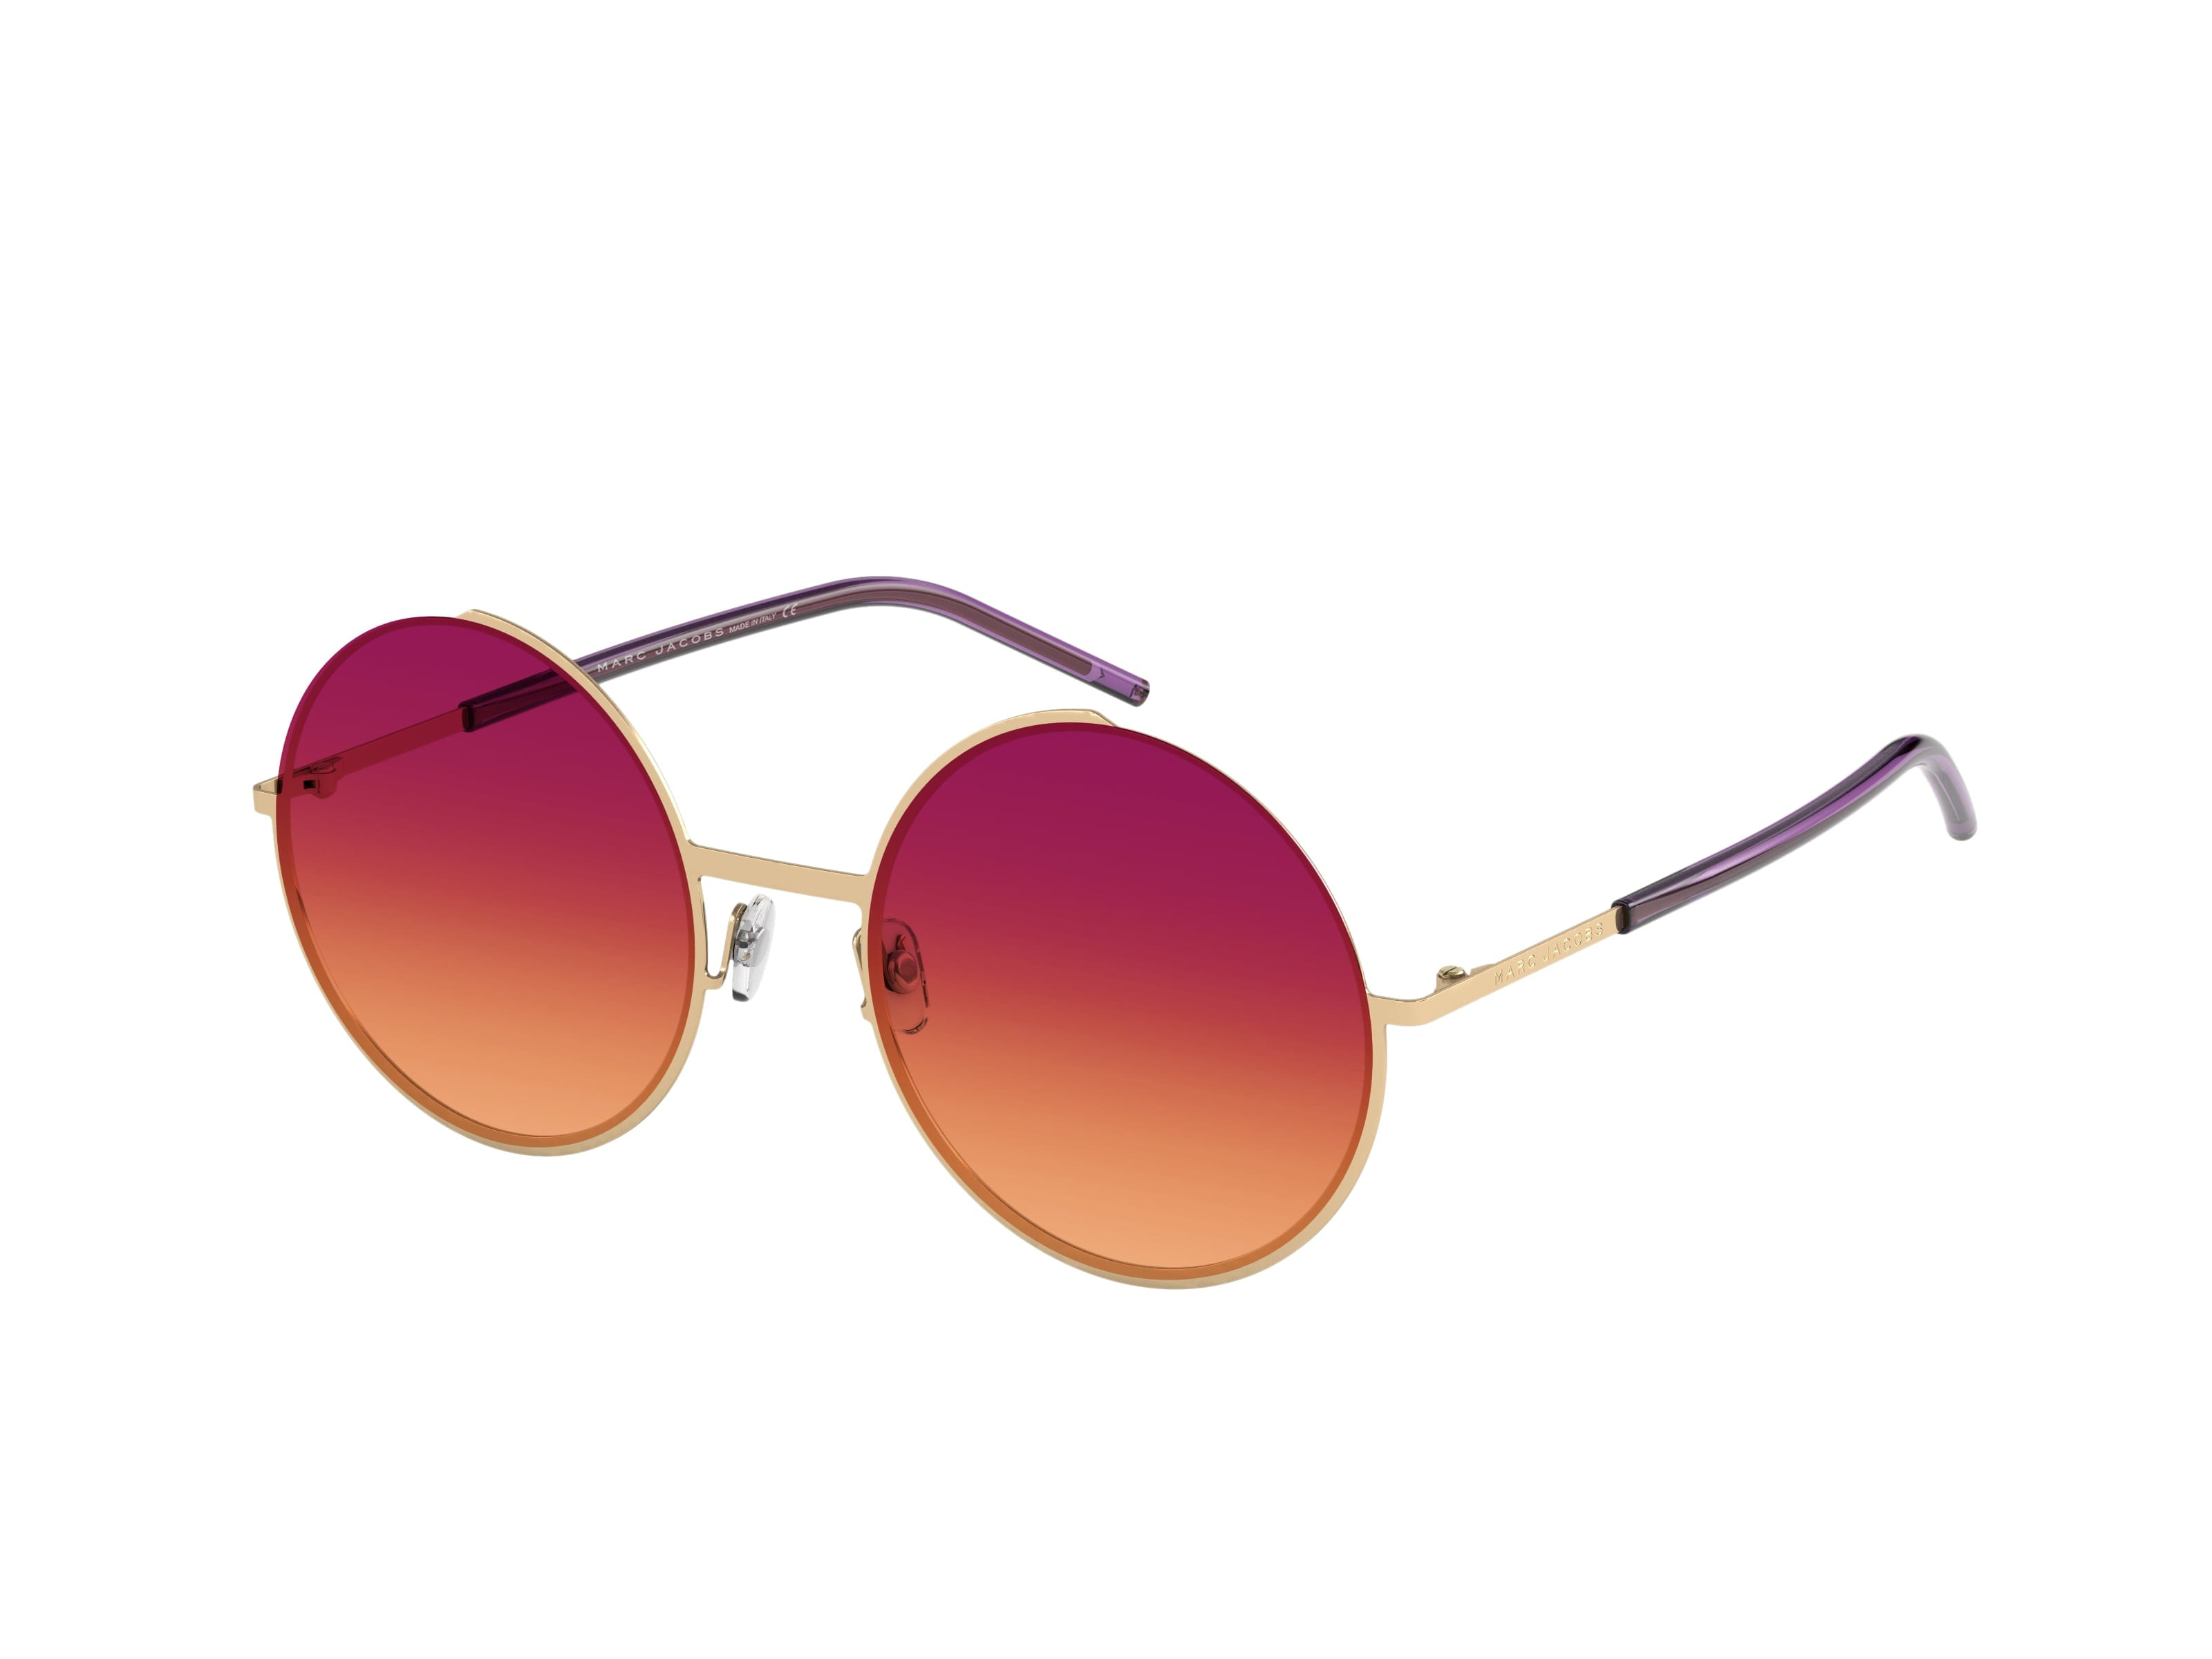 Marc Jacobs συλλογή γυαλιών άνοιξη καλοκαίρι 2016 - Efthimis is around 9f5d38d279b